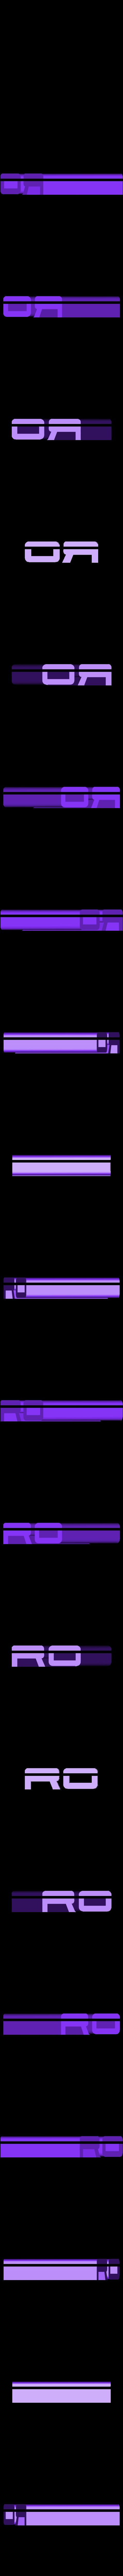 R1_blue.STL Download free STL file Multi-Color Robo R1 USB Holder • 3D print model, MosaicManufacturing